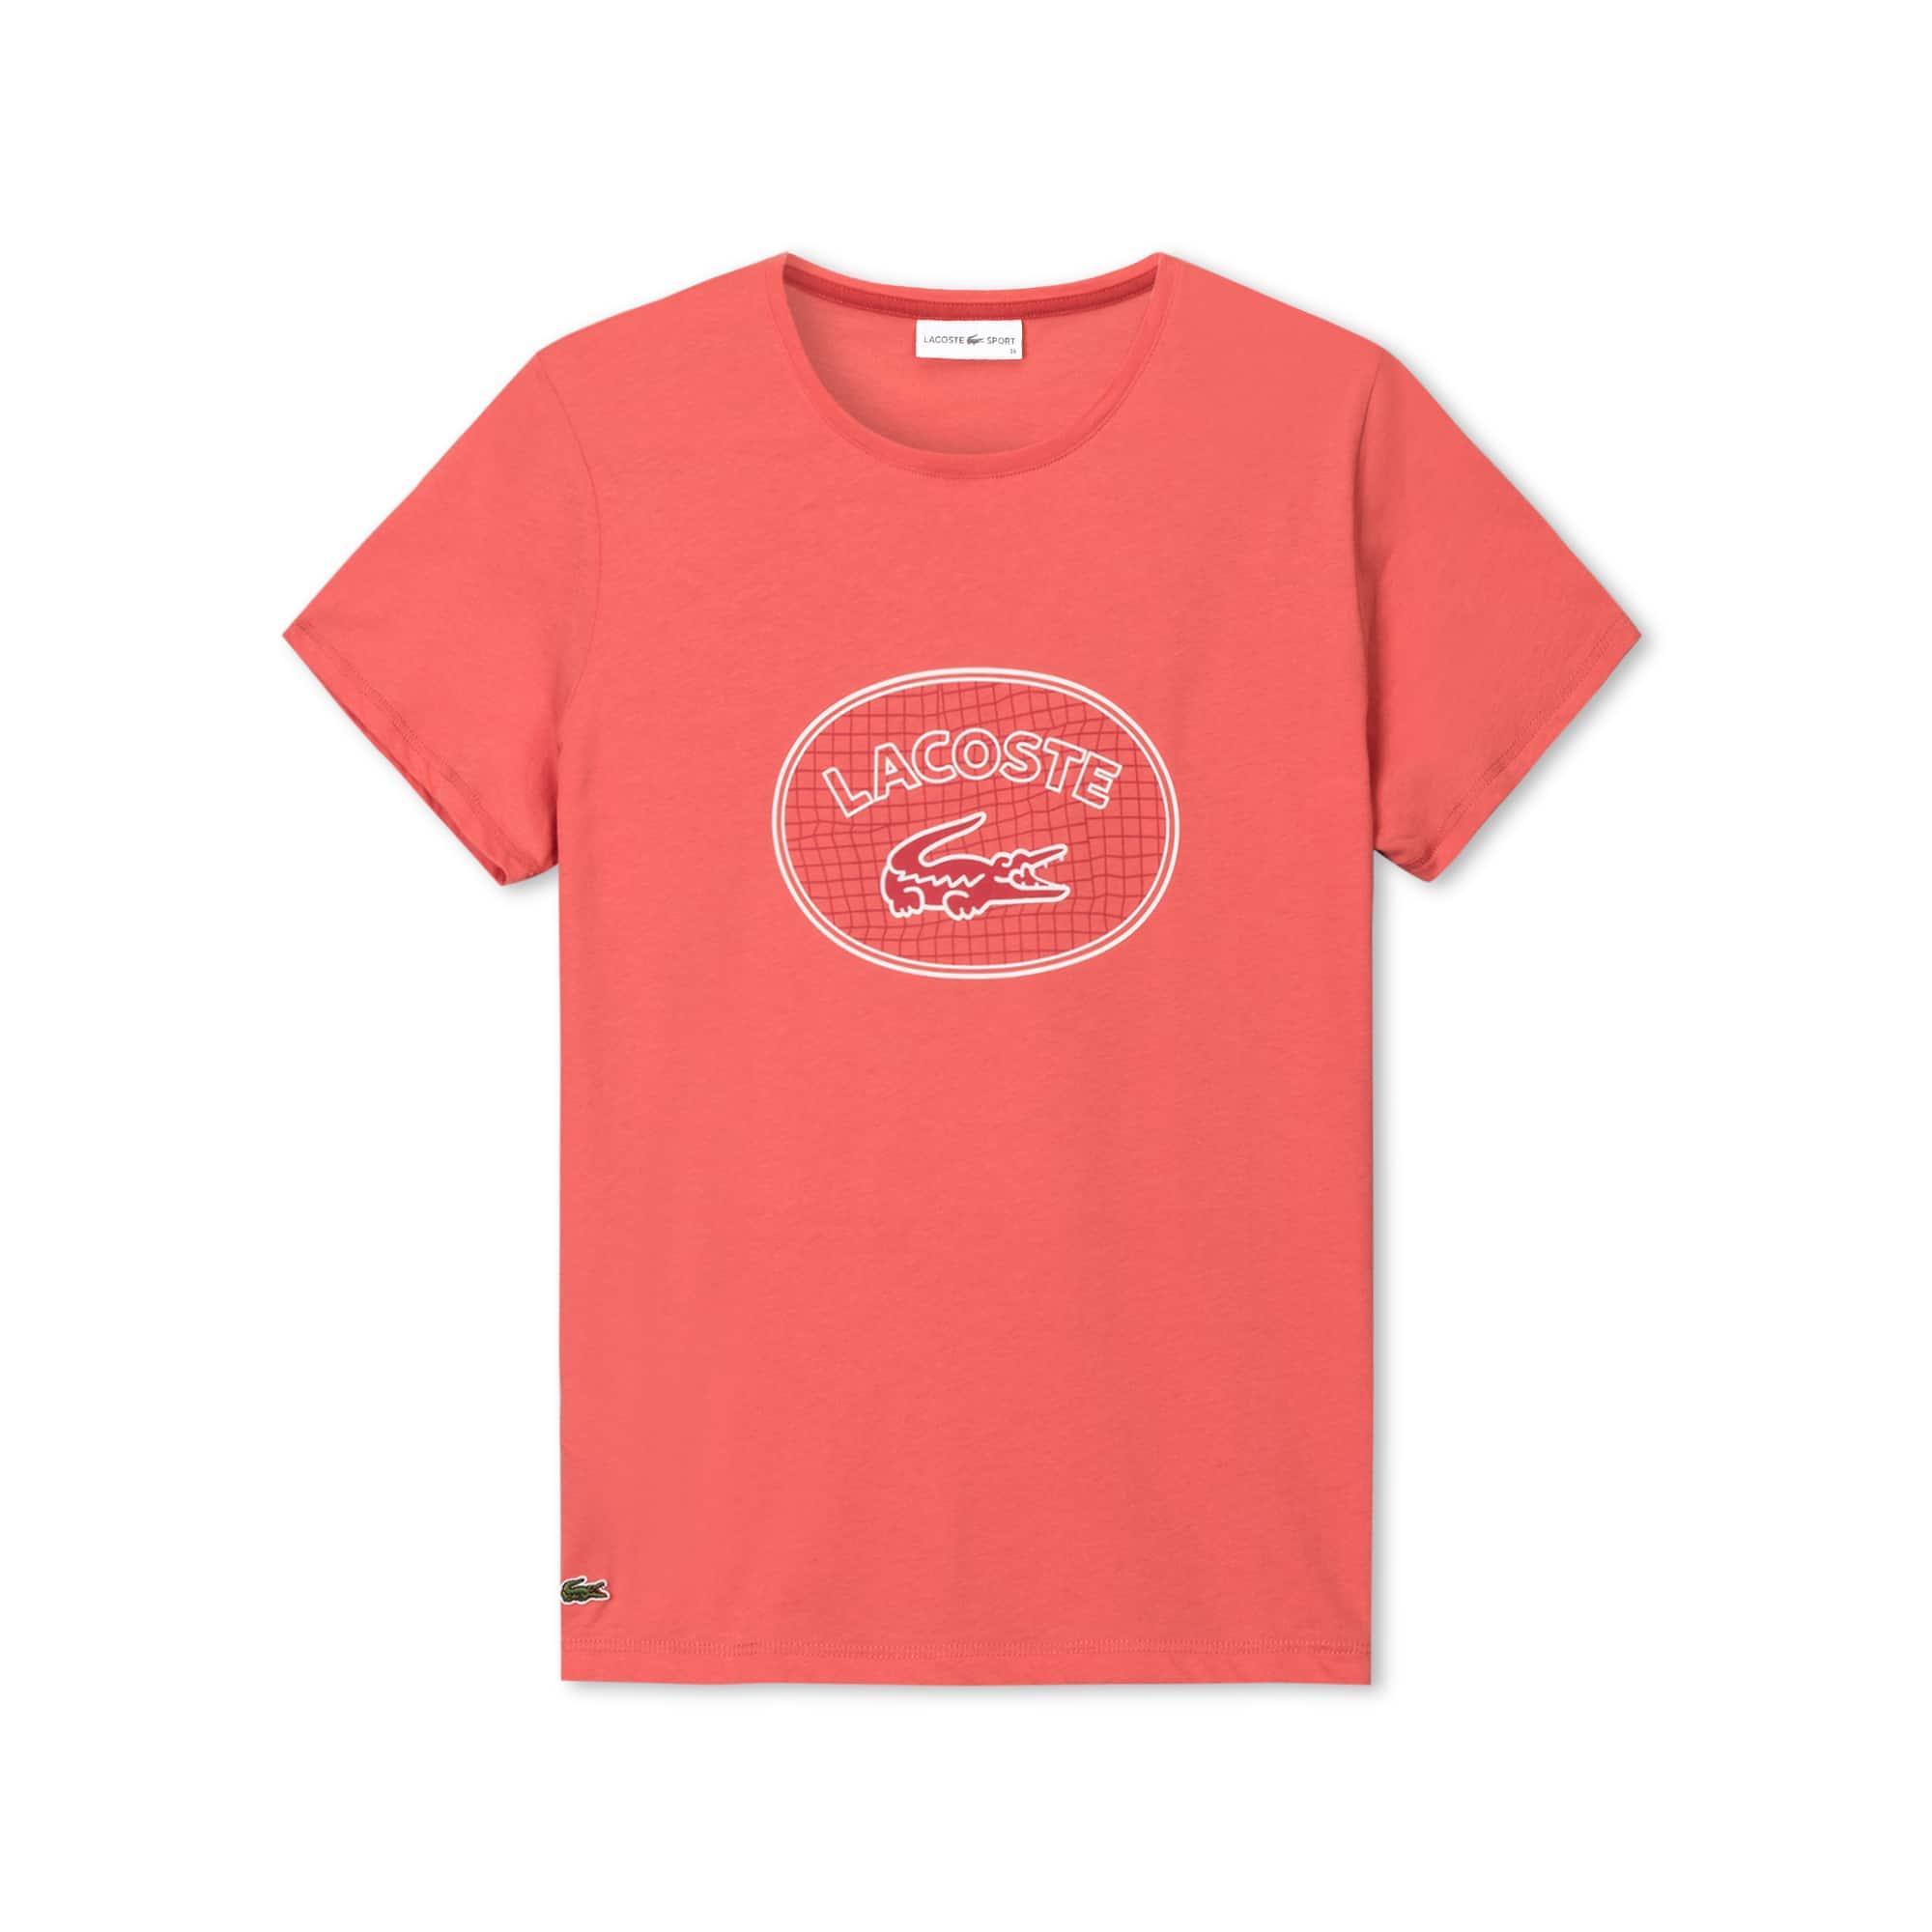 Lacoste SPORT女士大标志设计平纹单面针织网球T恤